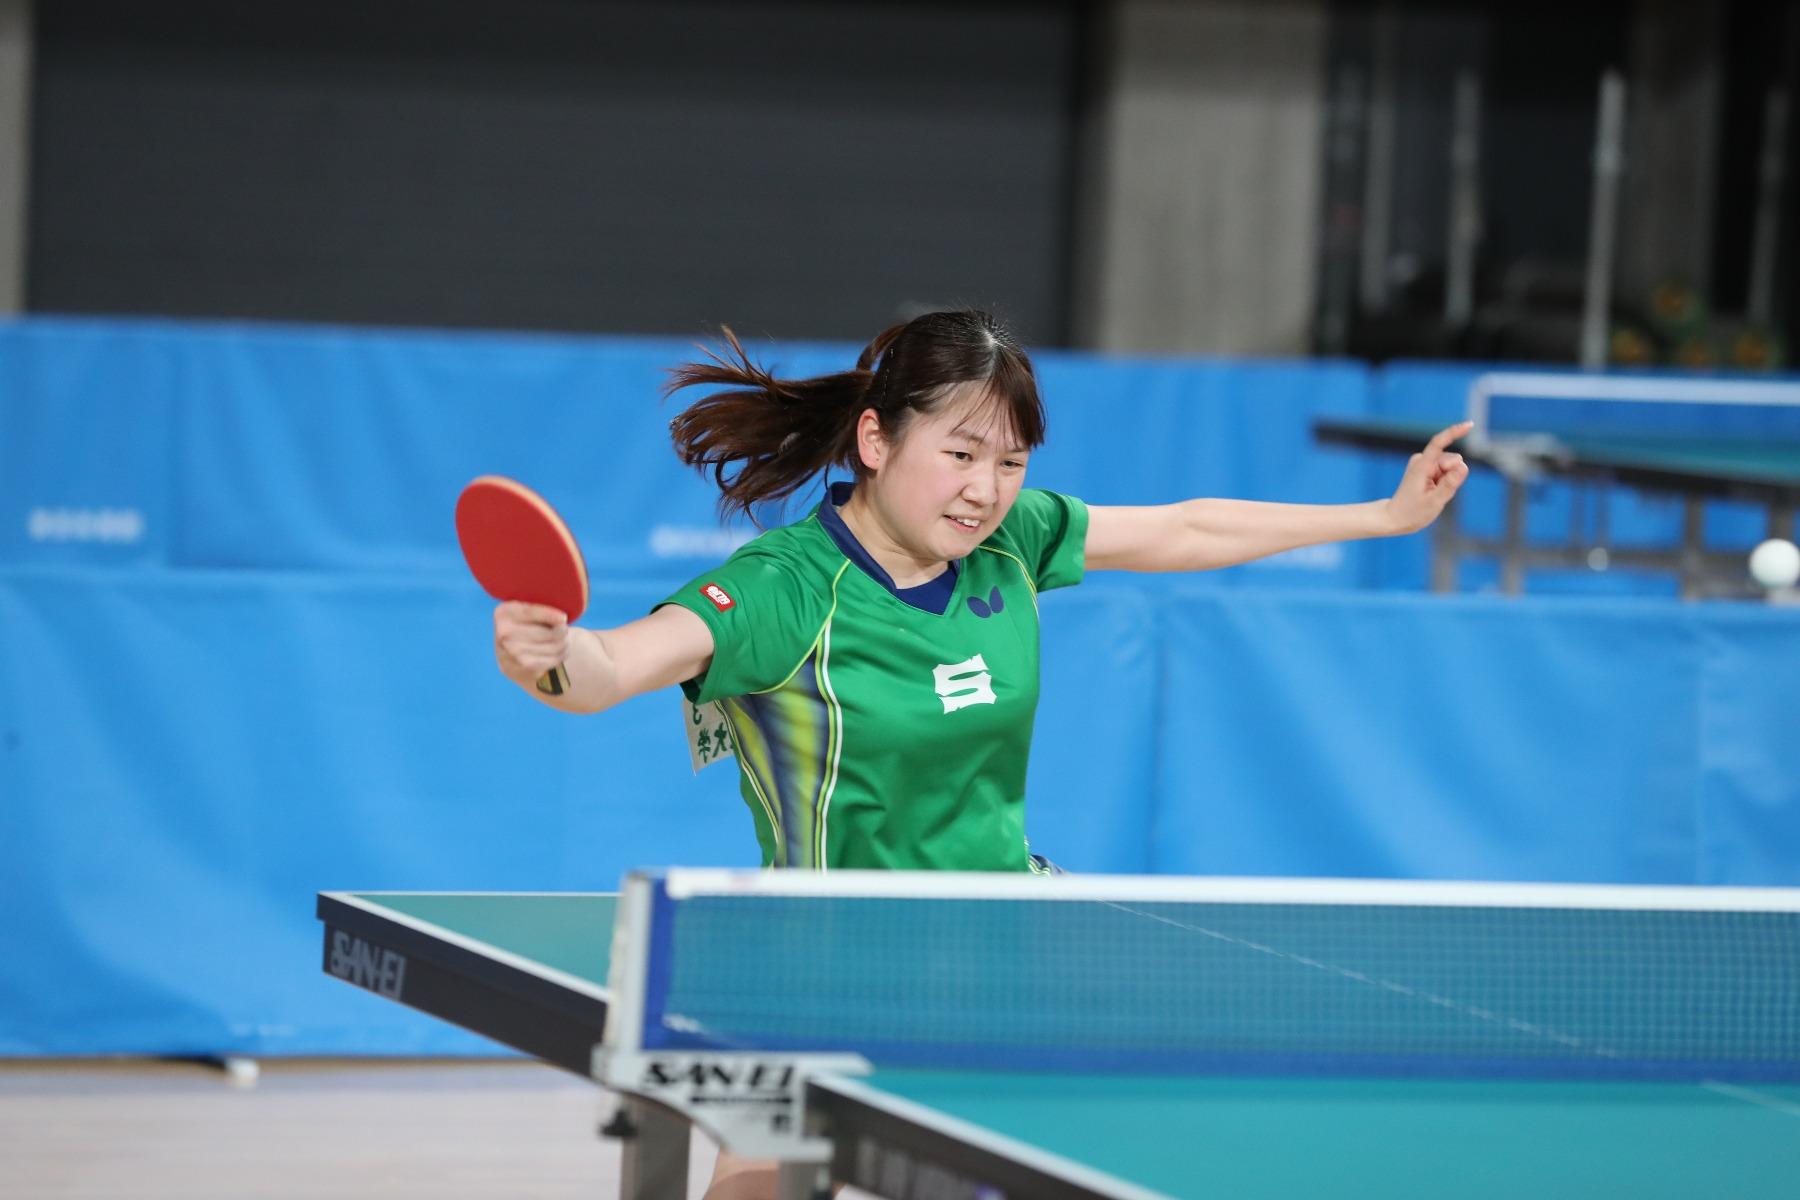 VICTAS VICTAS JOURNAL 卓球 東京優勝大会 女子シングルス 3位 大島奈々